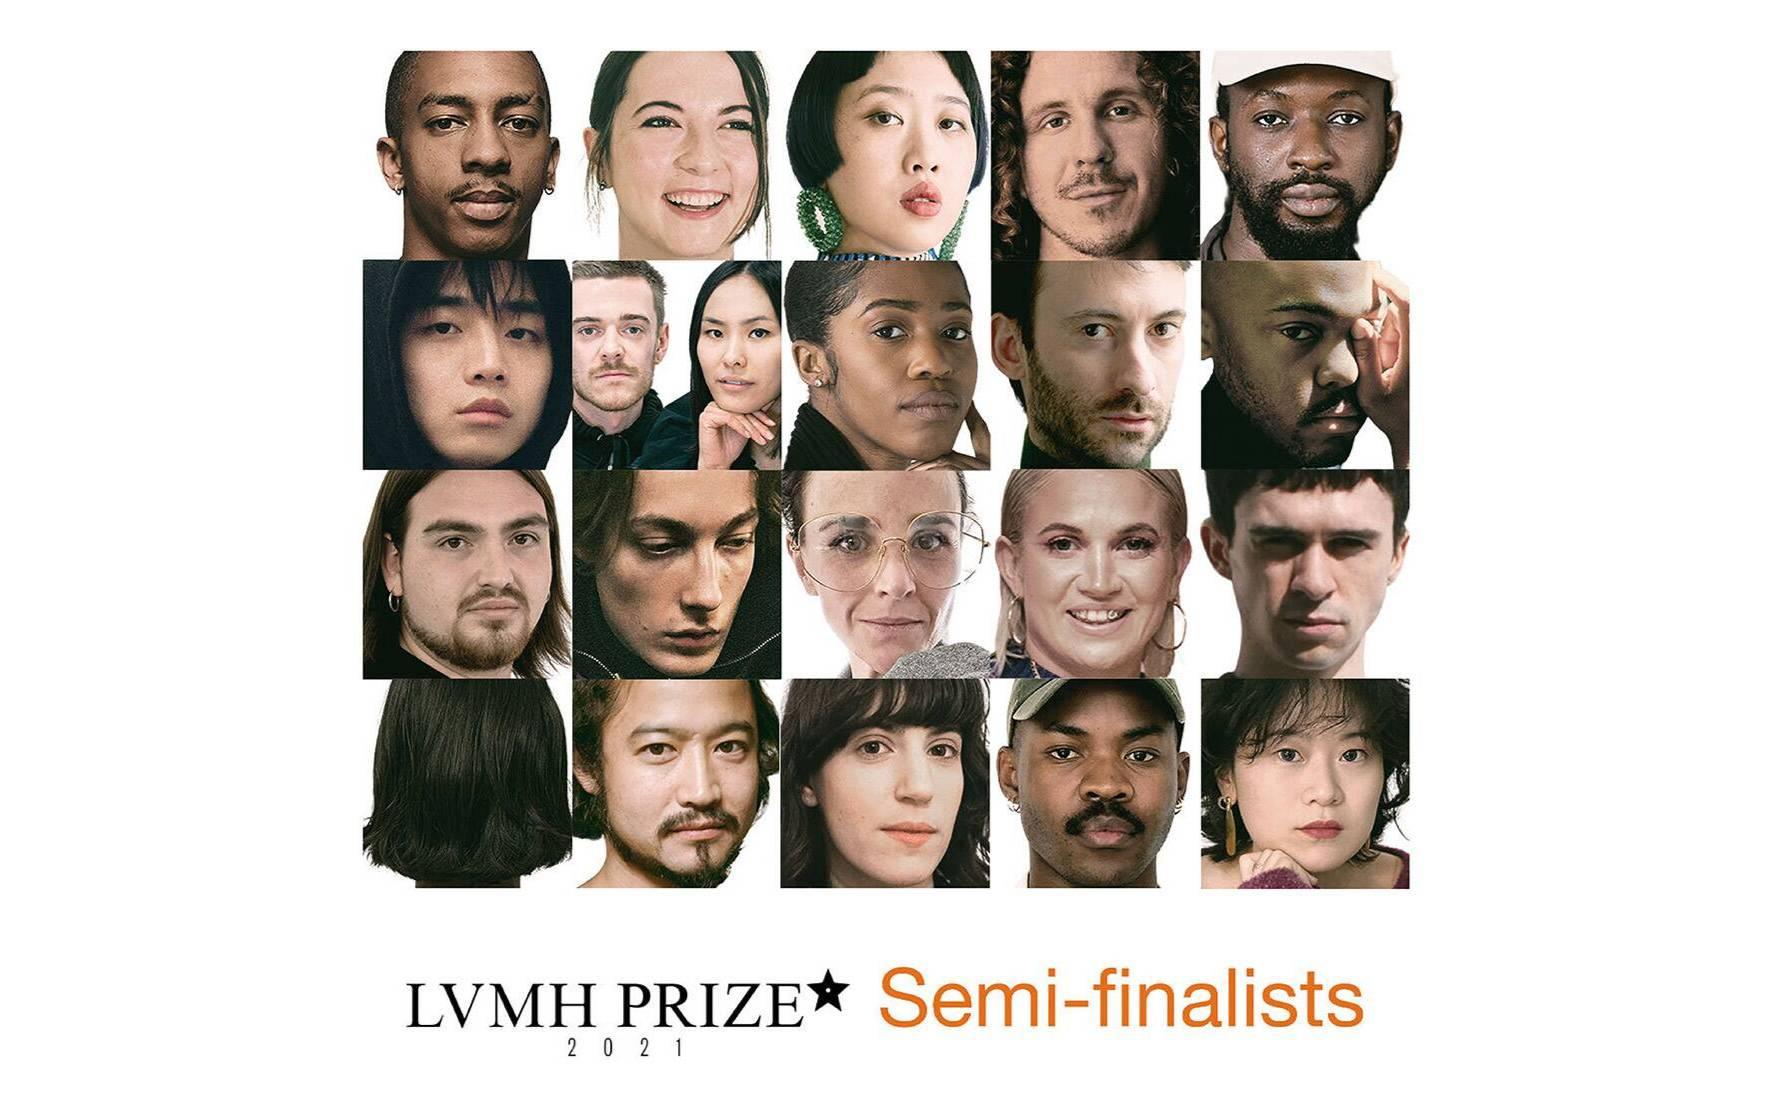 LVMH announces semi-finalists for young fashion designer prize